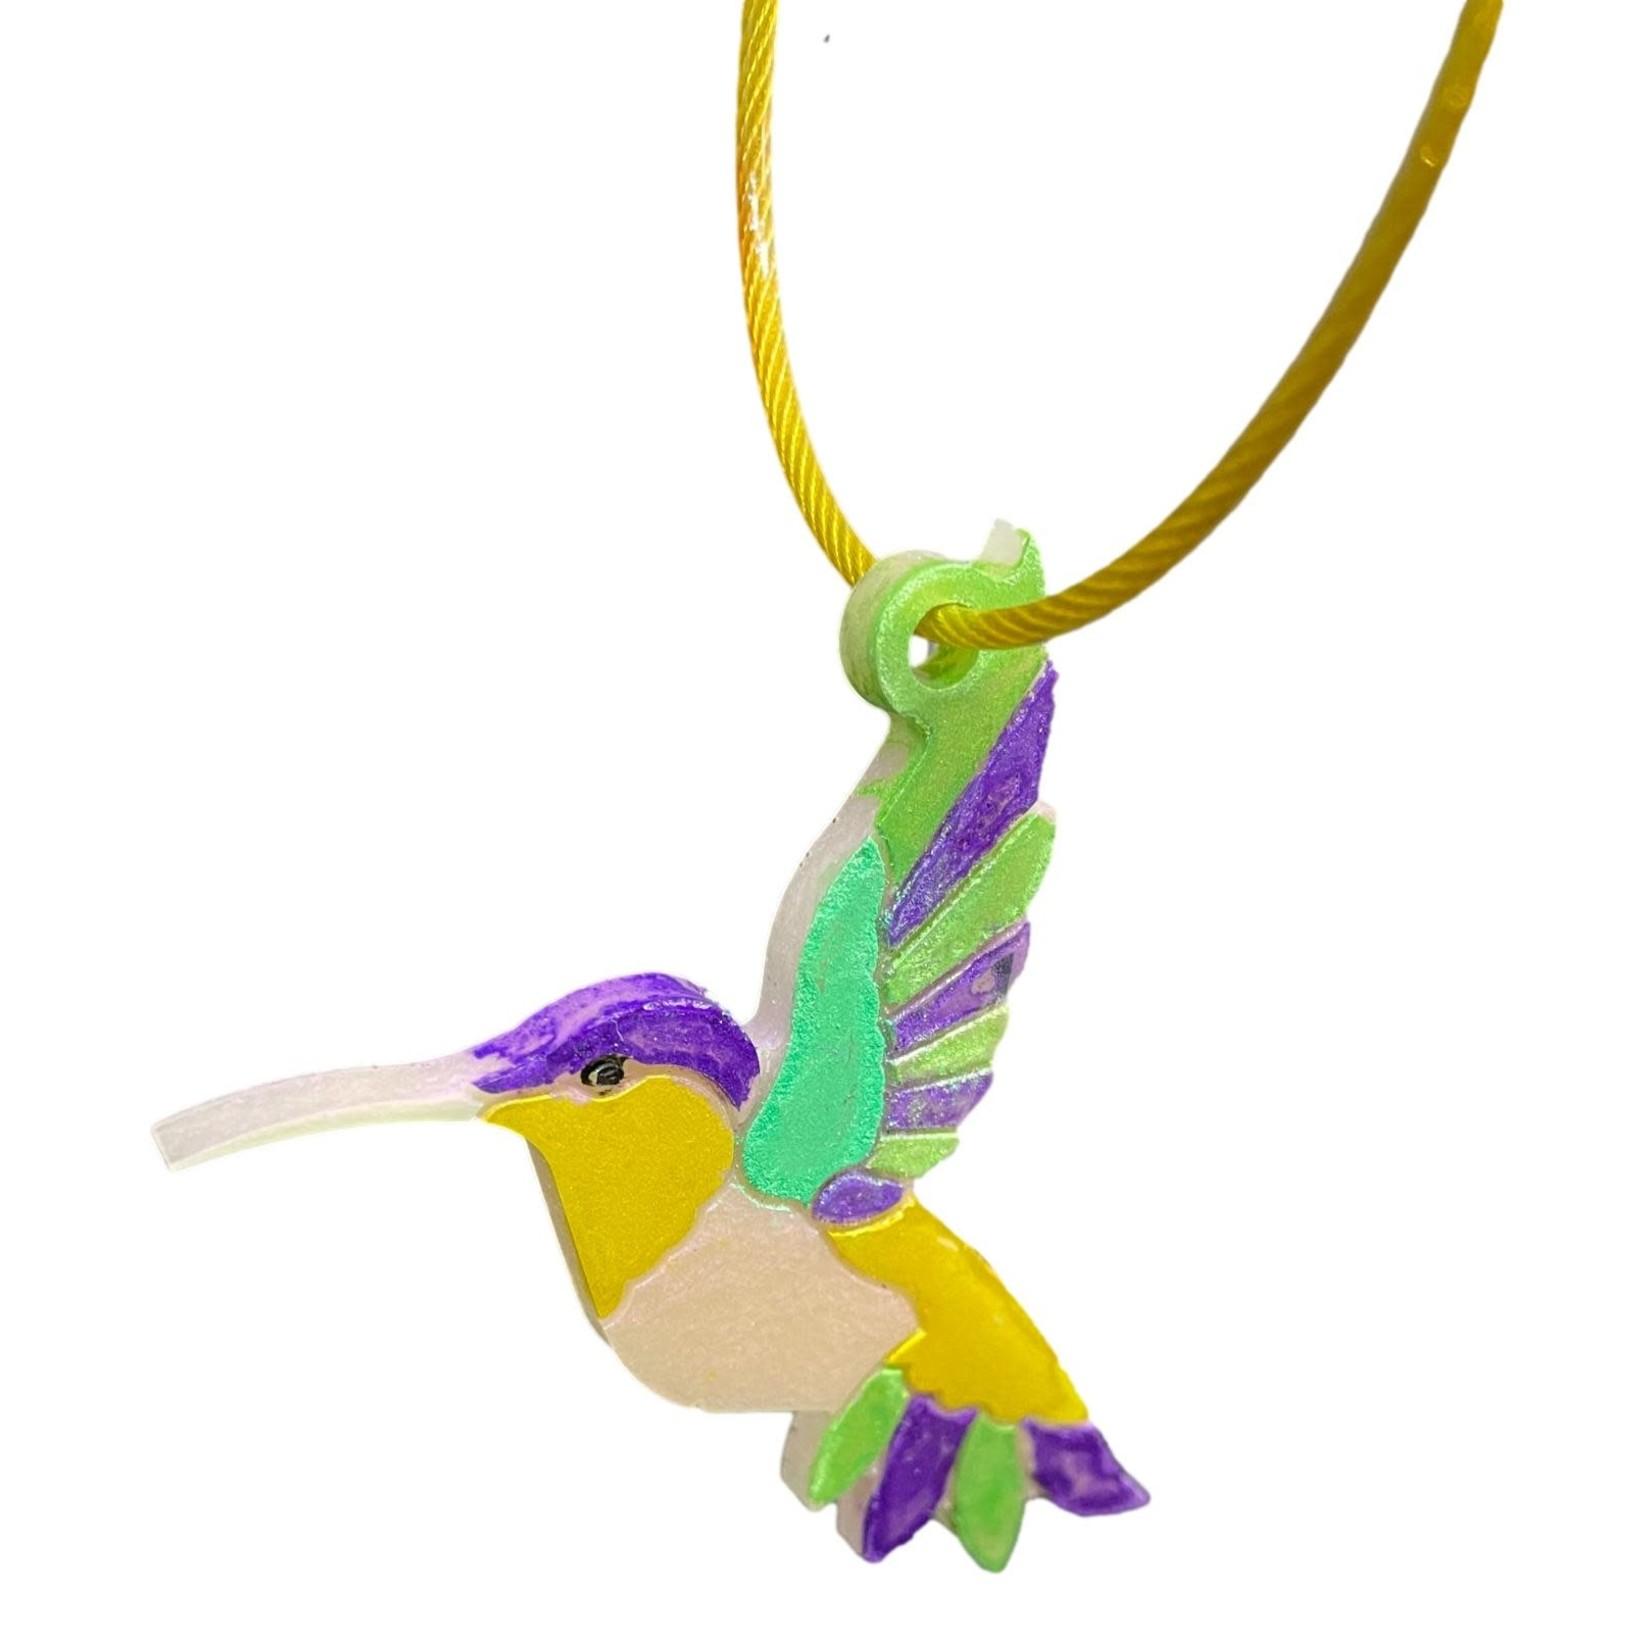 East Coast Sirens Colourful Hummingbird Key Chain